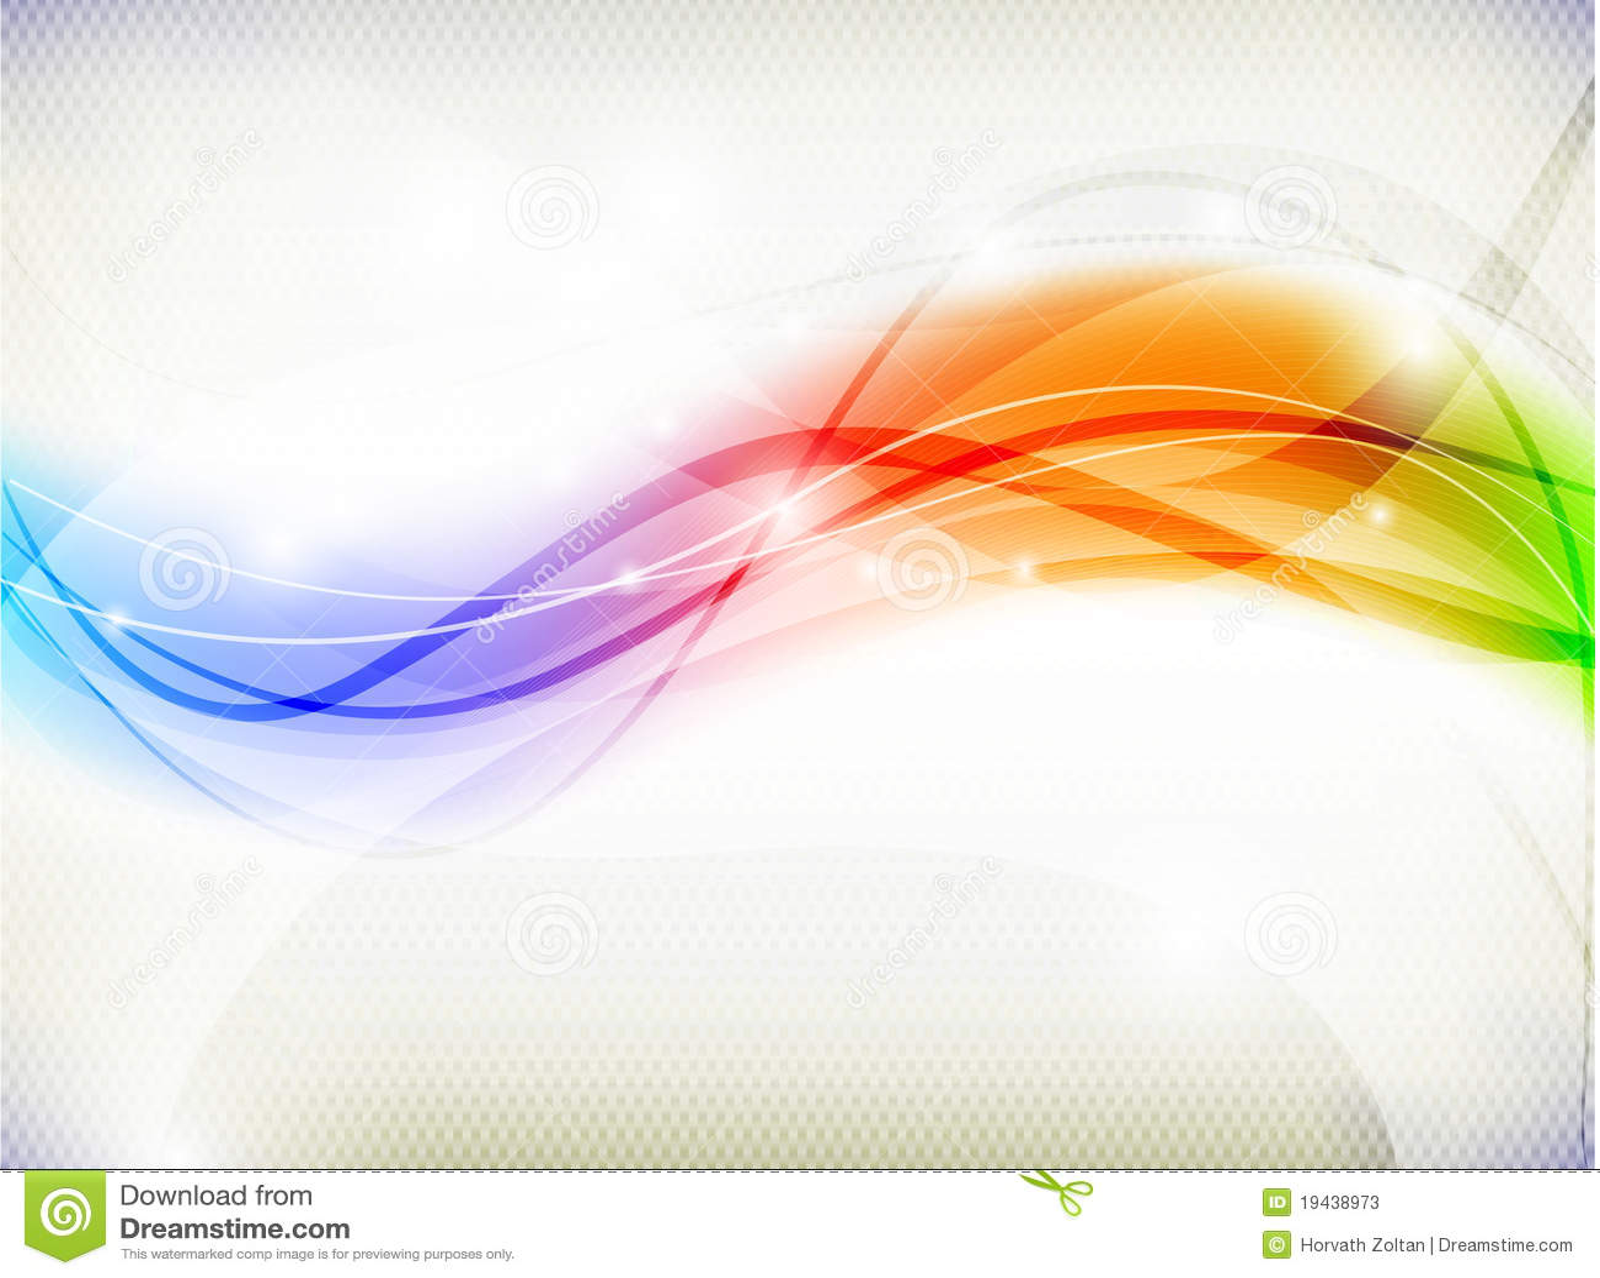 Abstrakter Regenbogen-Hintergrund Stockfotos - Bild: 19438973